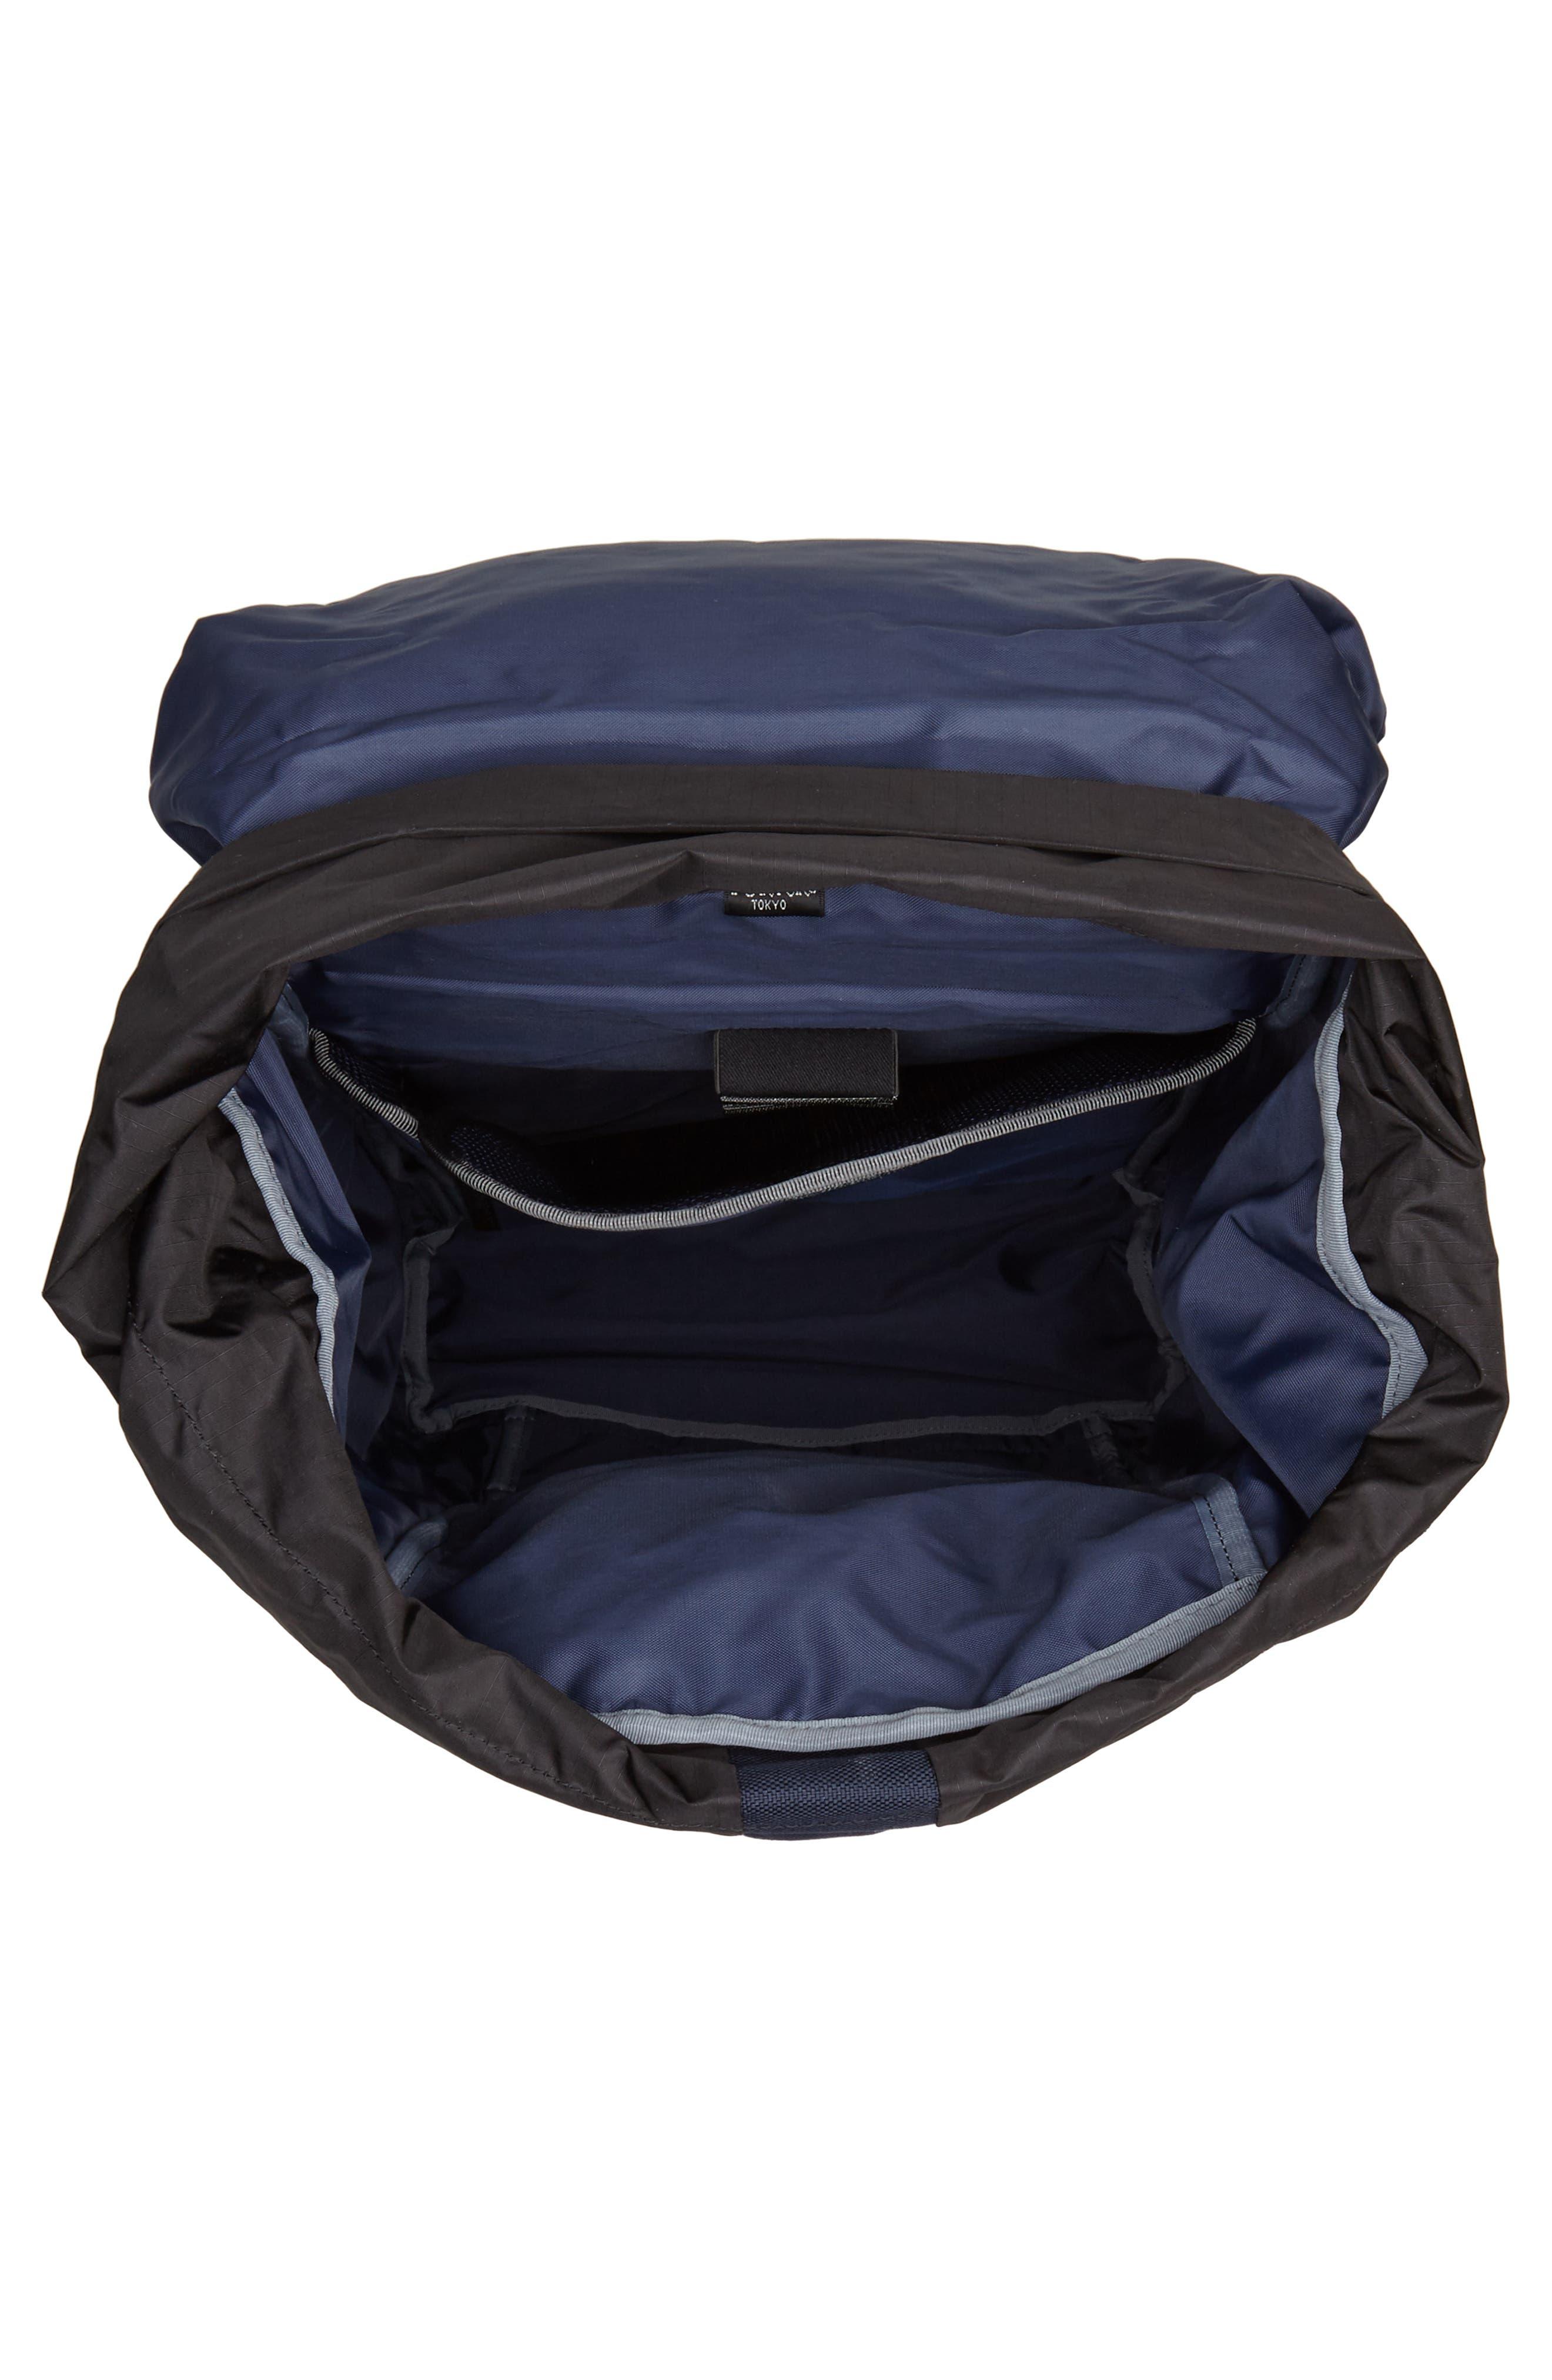 Porter-Yoshida & Co. Hype Backpack,                             Alternate thumbnail 4, color,                             Navy/ Black